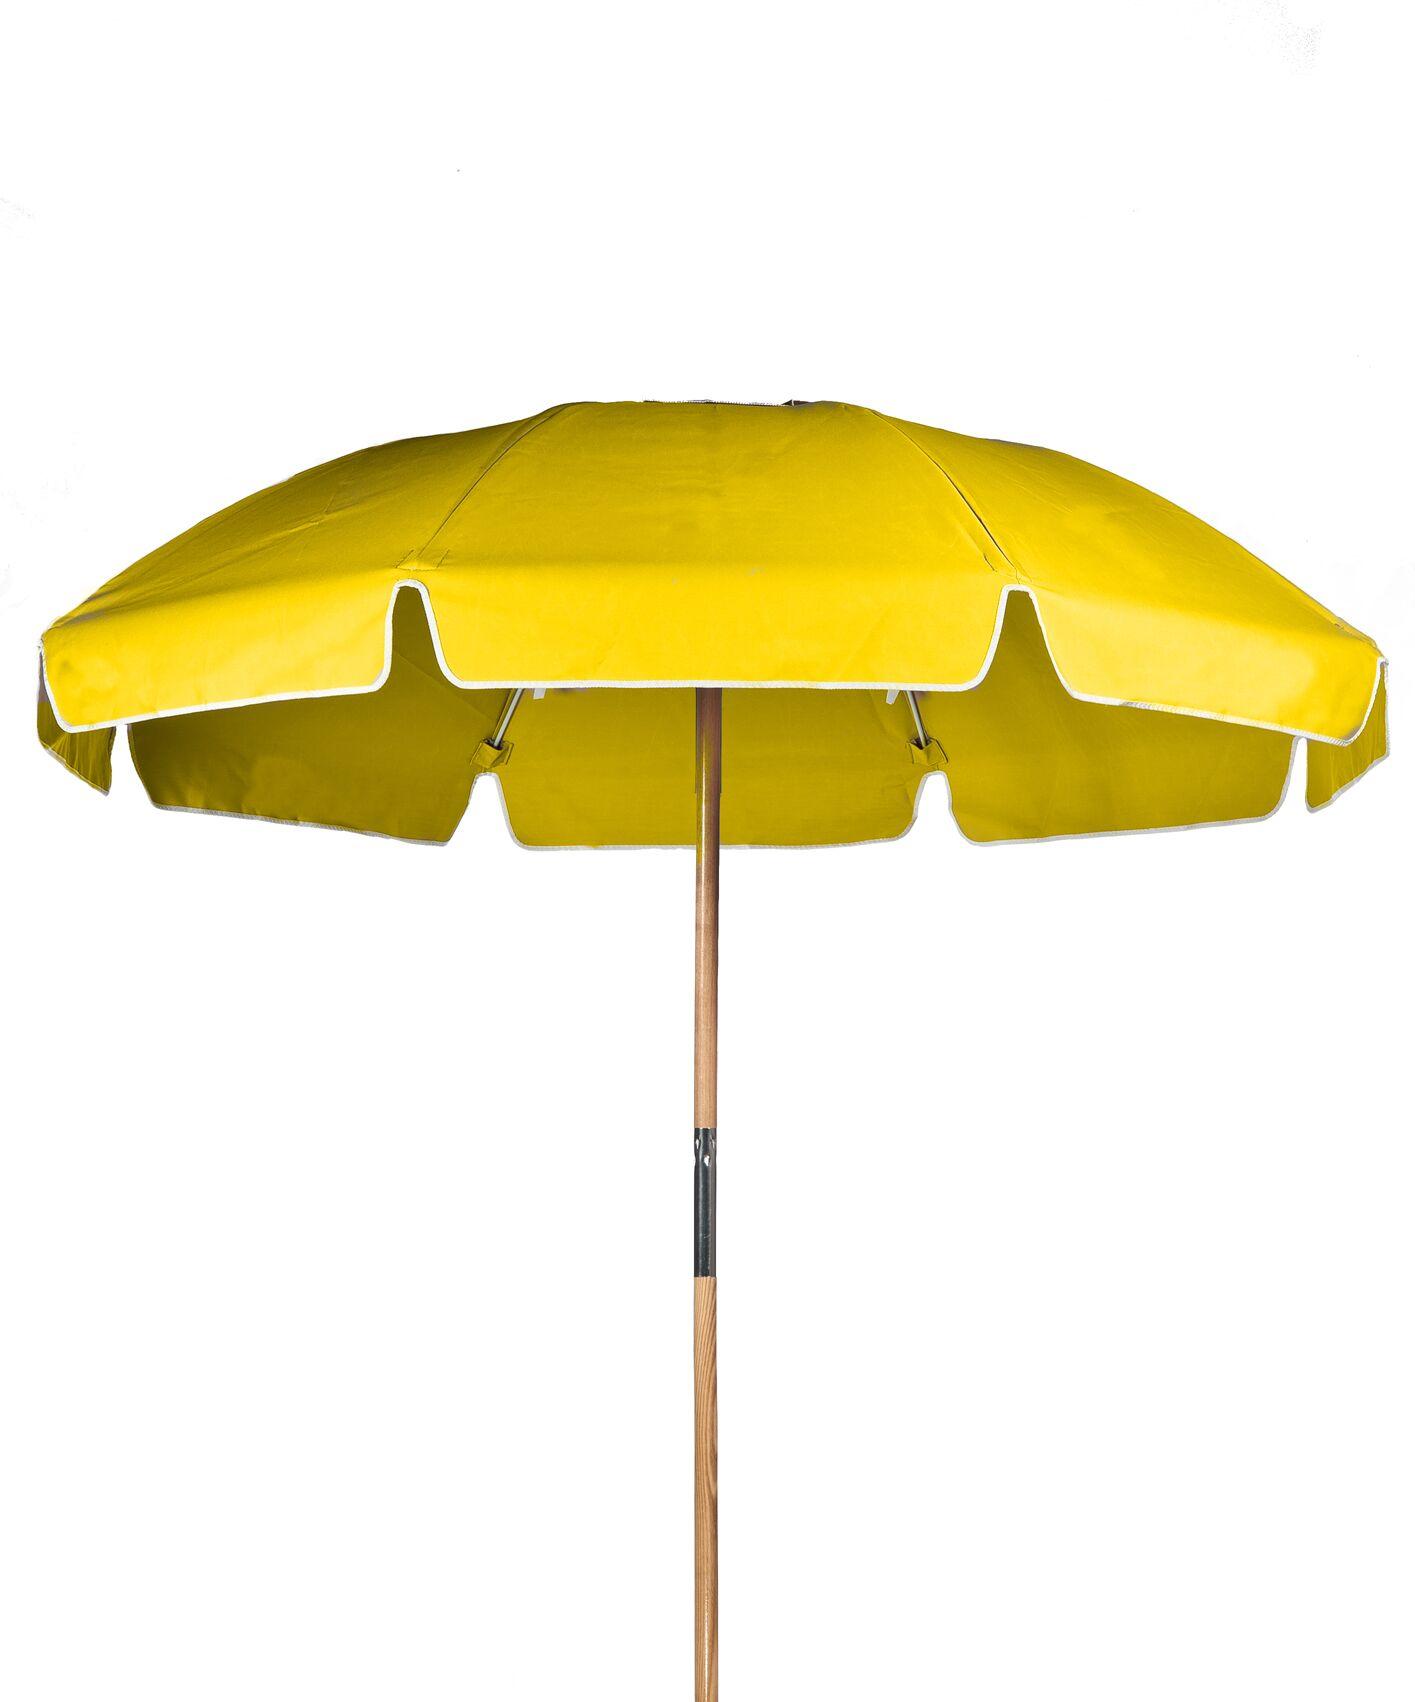 7.5' Drape Umbrella Fabric: Yellow Acrylic